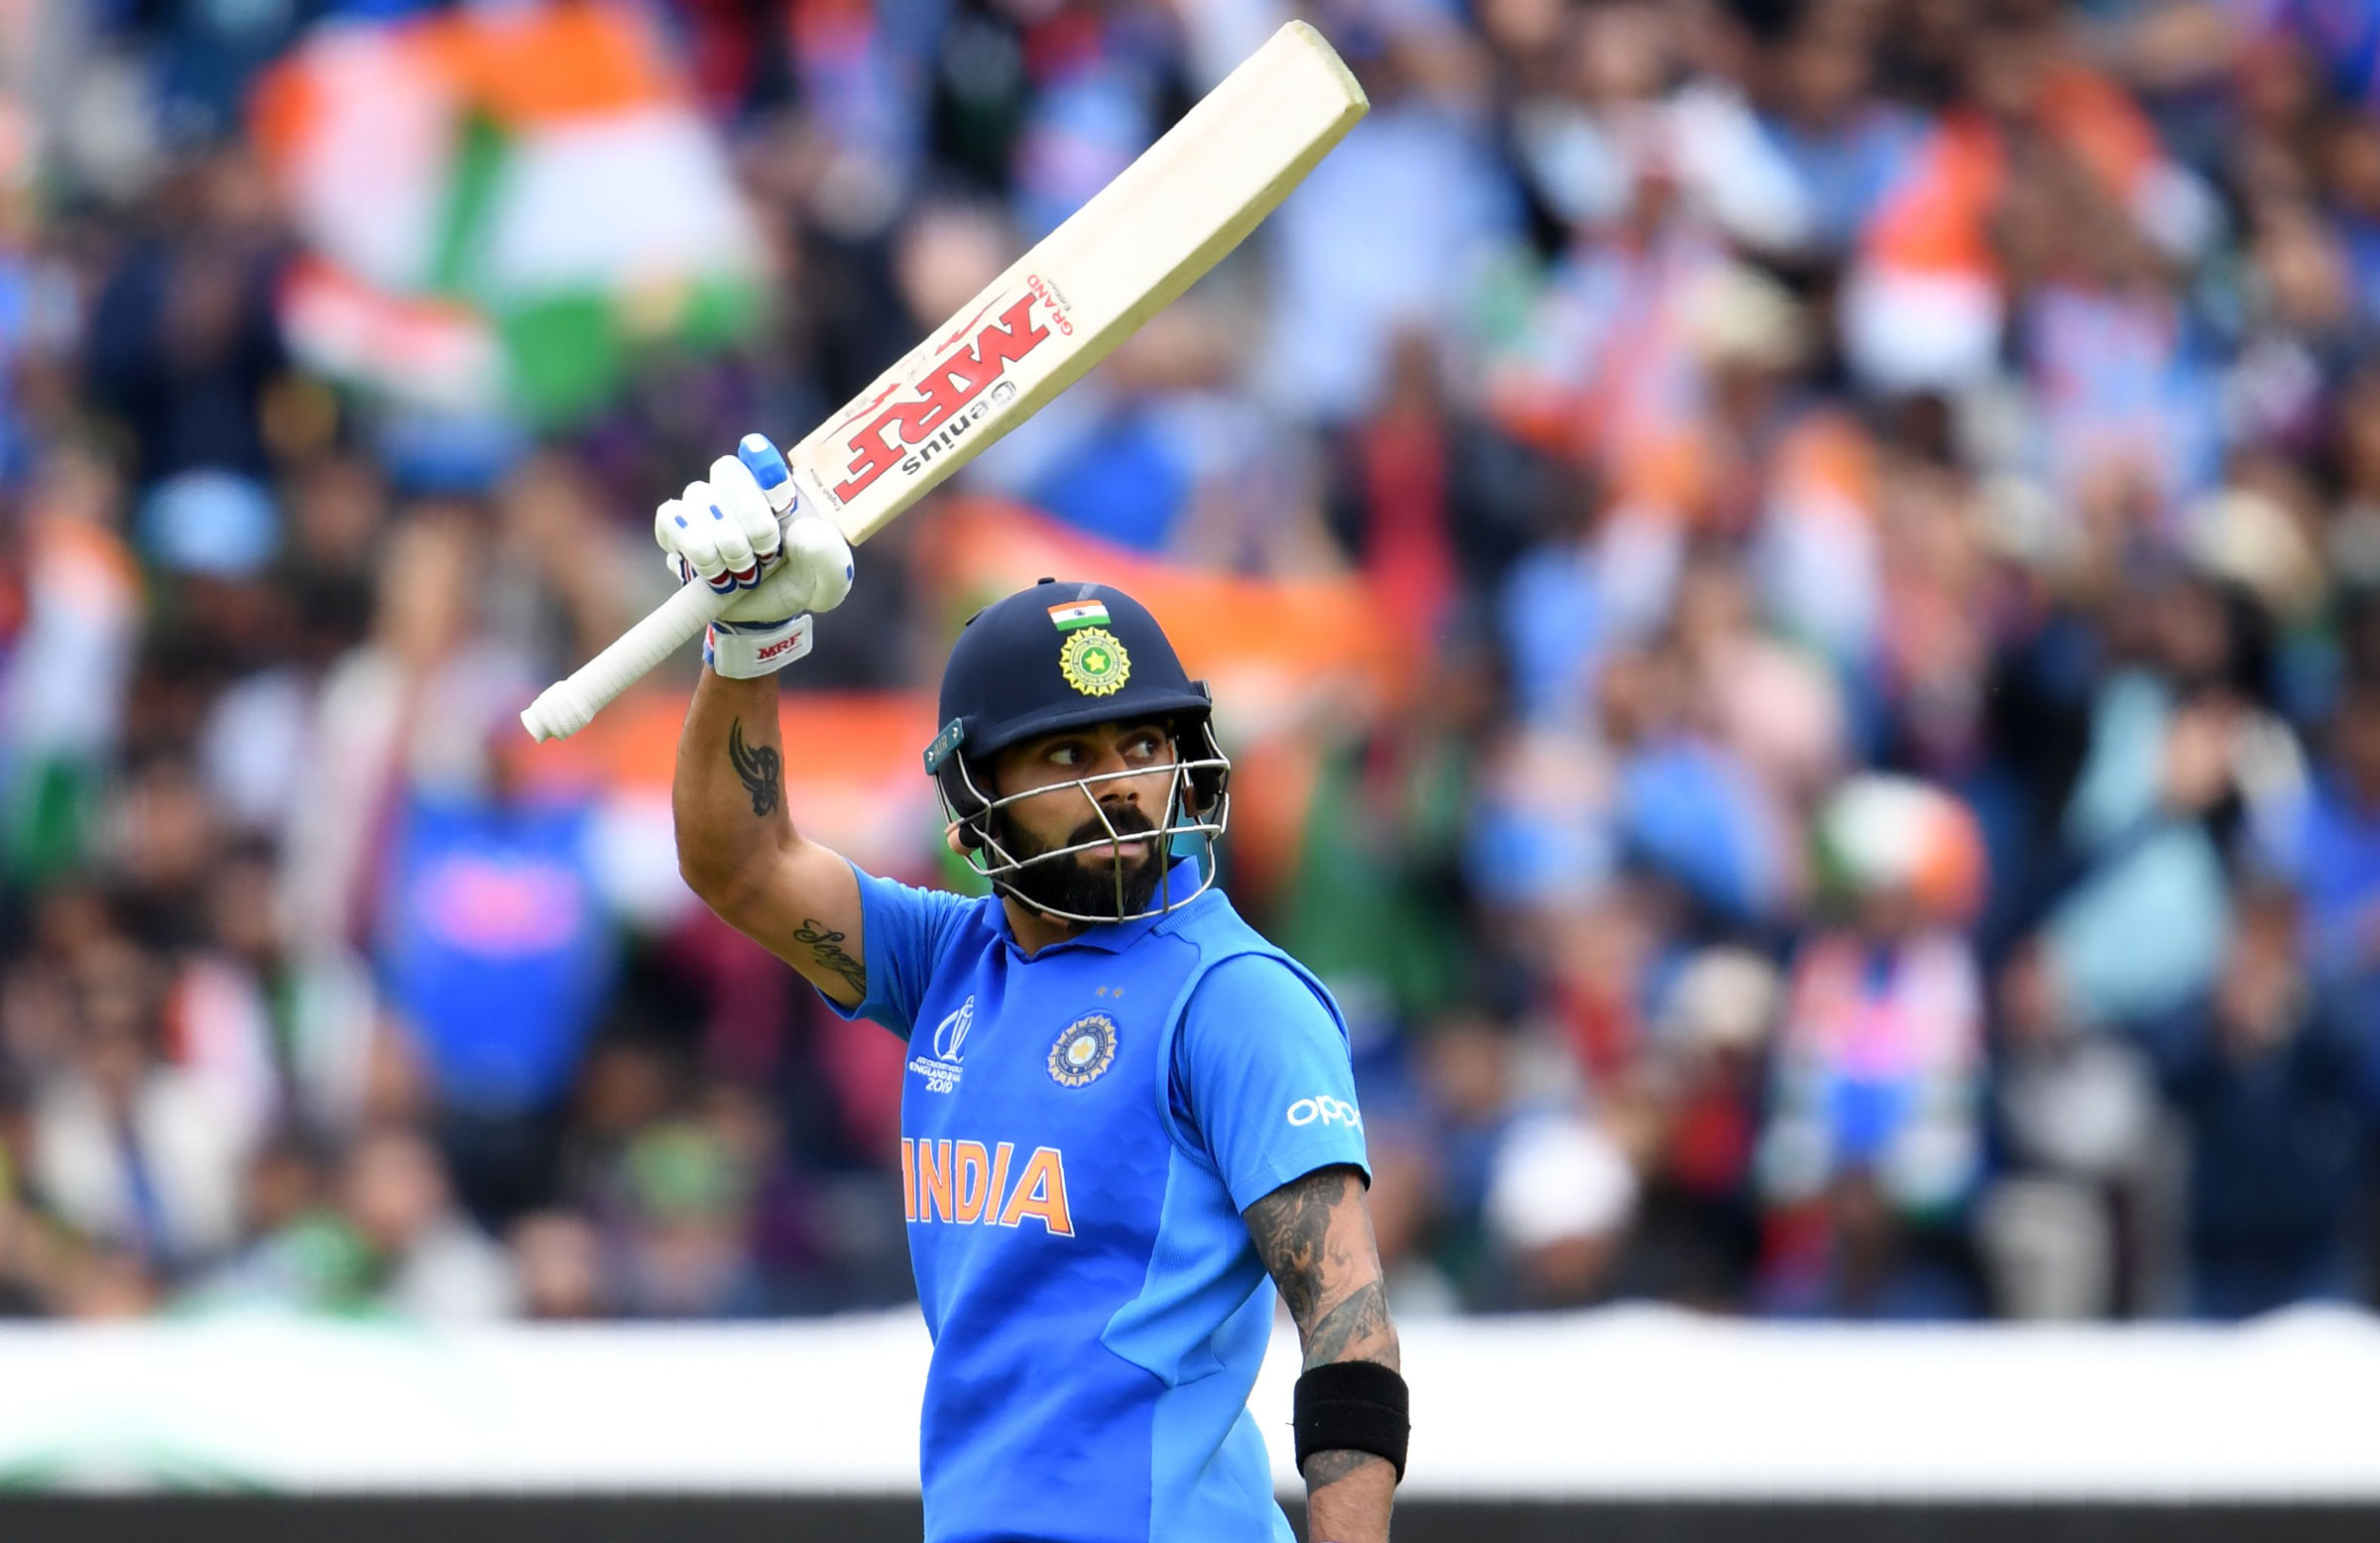 Virat Kohli set a new record for fastest to 11,000 ODI runs // Getty